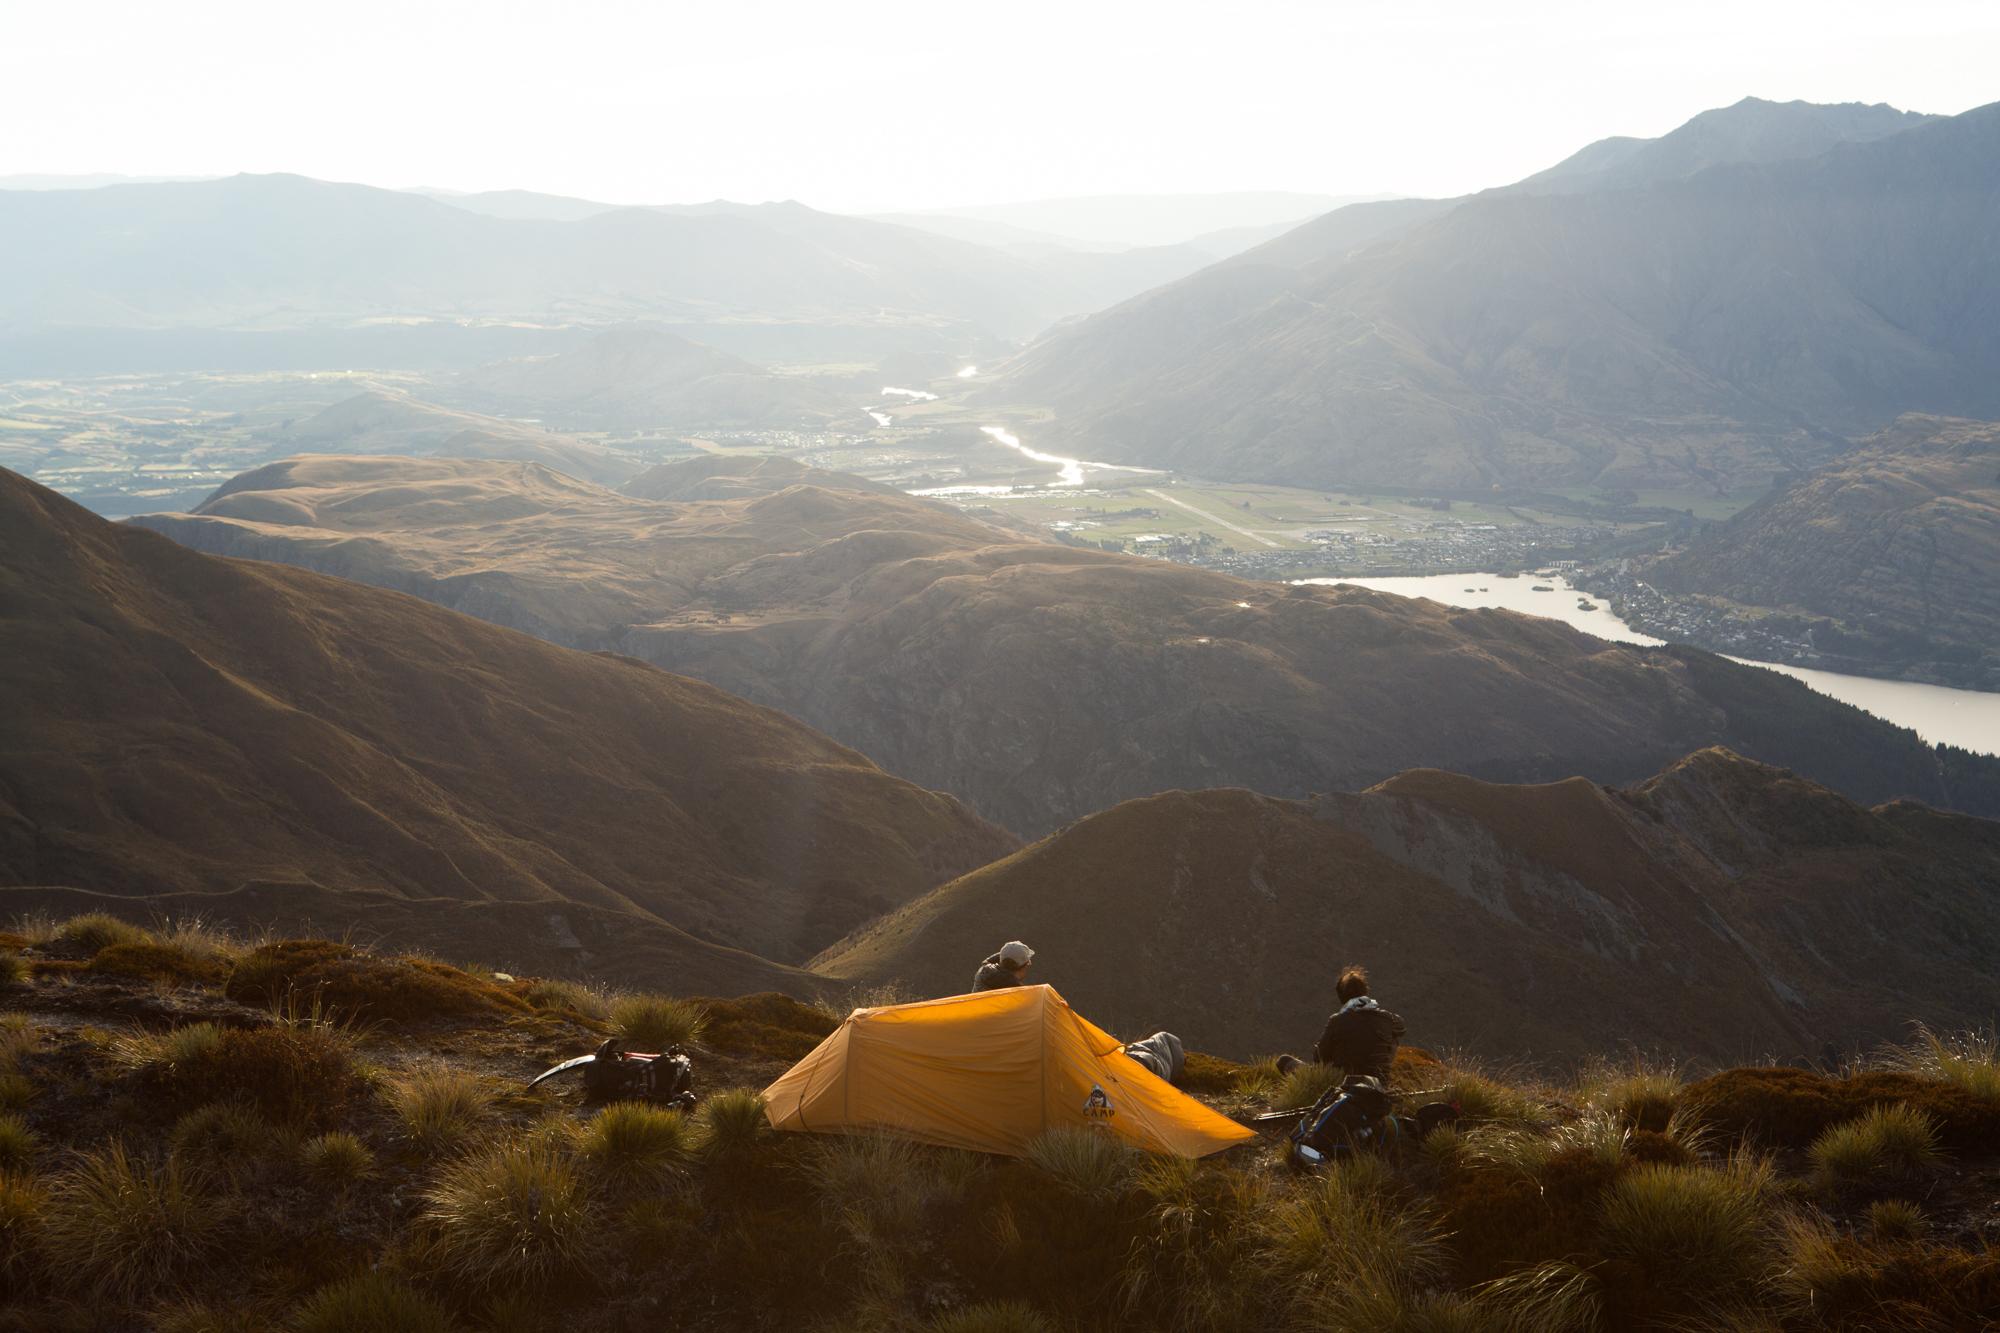 14-Bec_Kilpatrick_Photography_New_ZealandBEC_1169